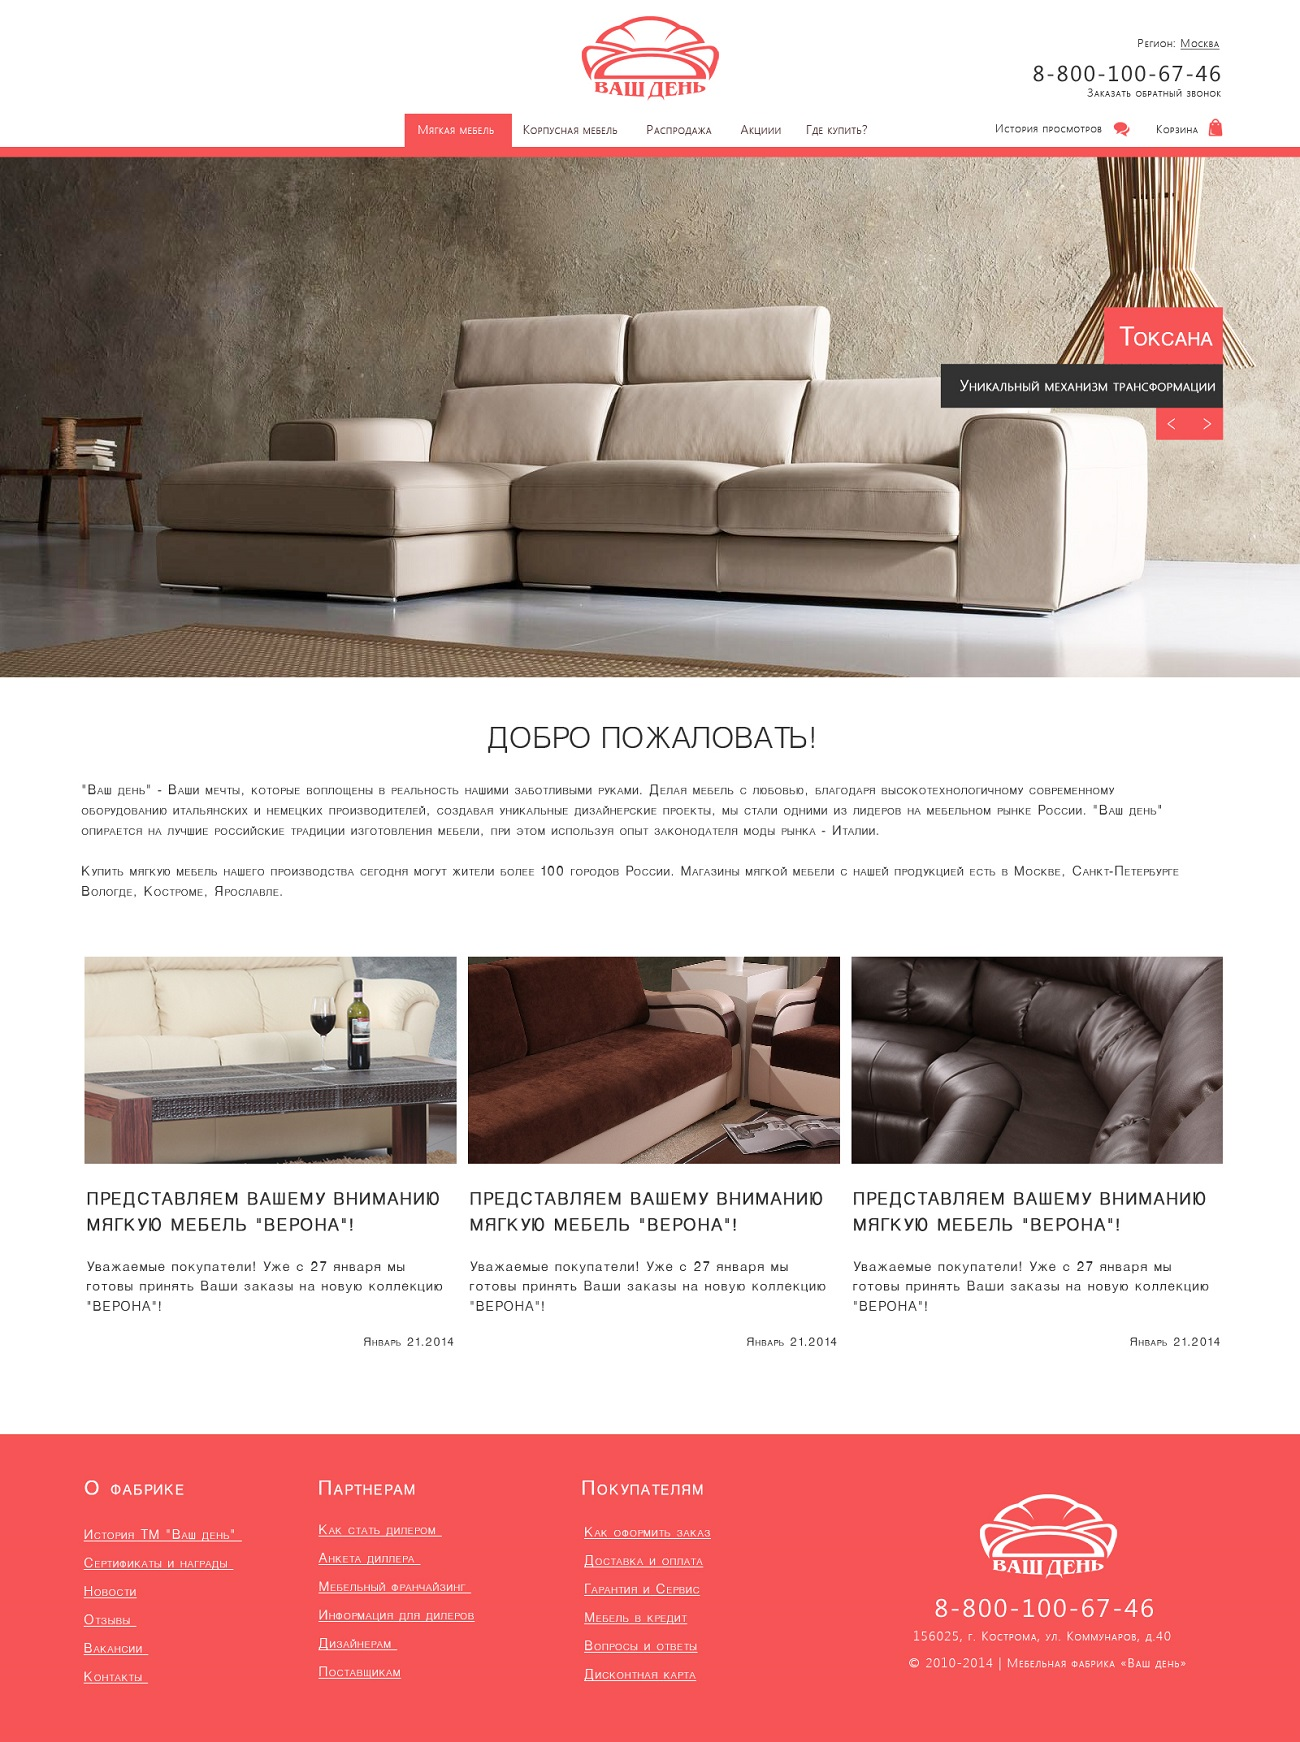 Разработать дизайн для интернет-магазина мебели фото f_86752e92deea8113.jpg